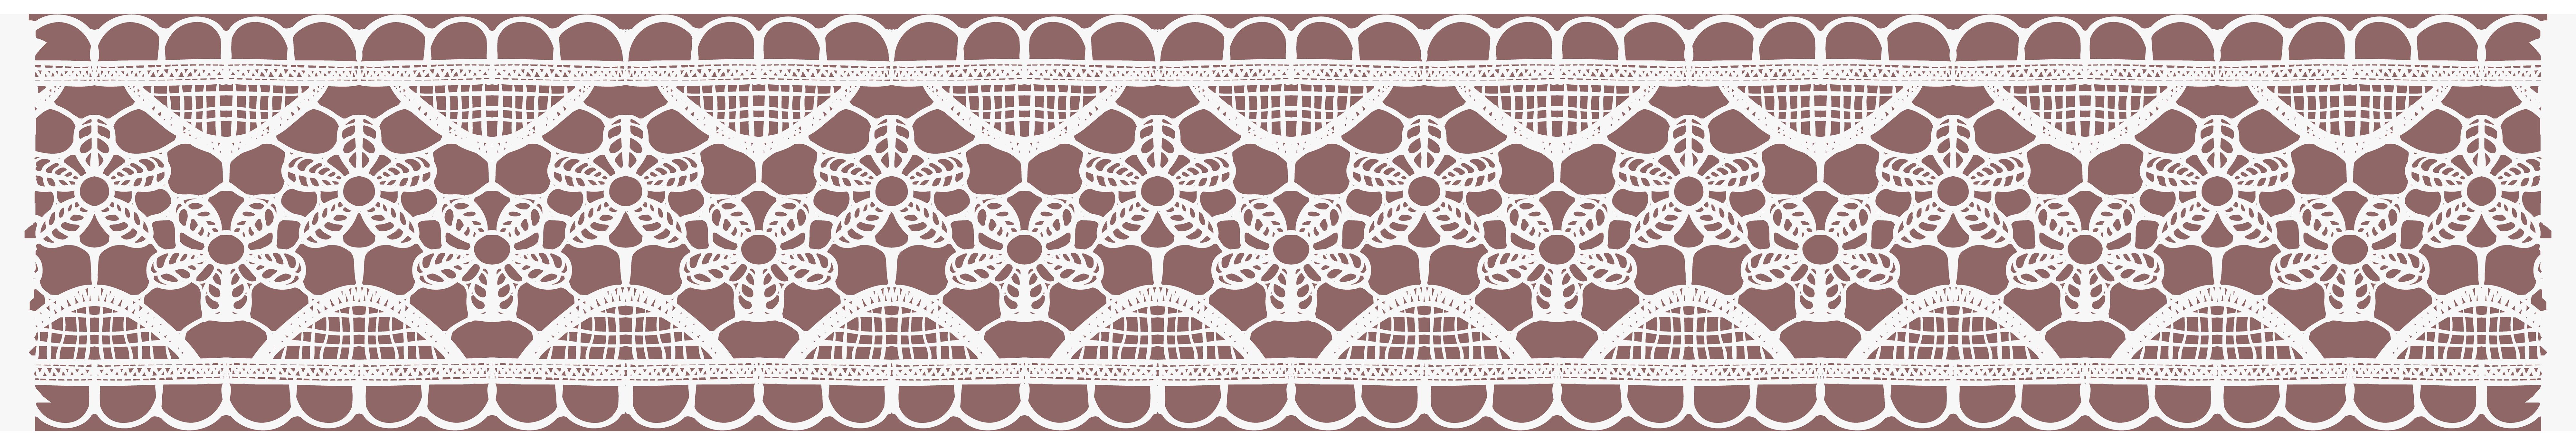 lace clipart silver lace